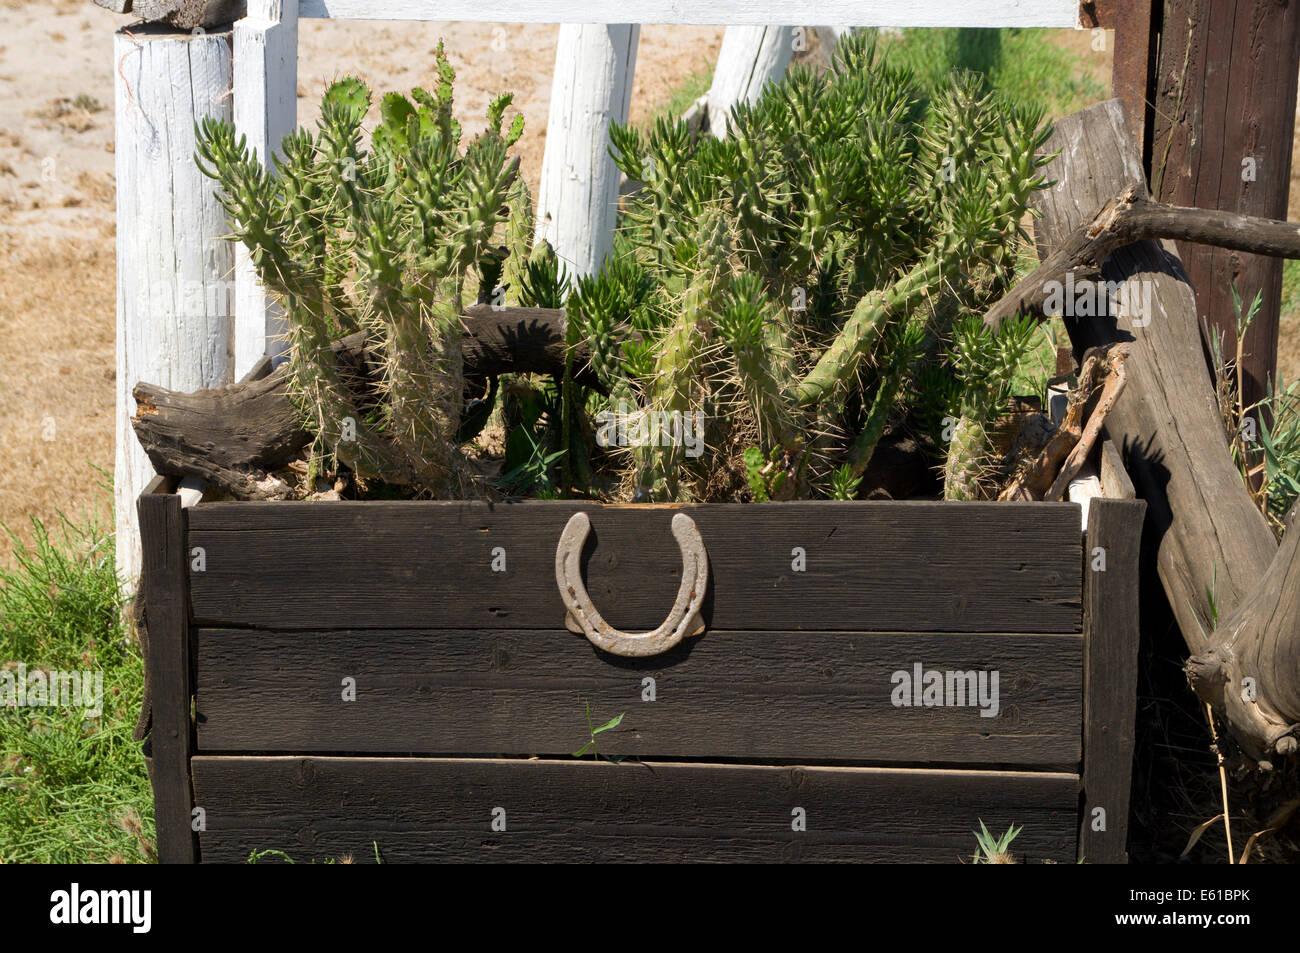 Lucky horseshoe and cacti, Salt Lake Stables, Tingaki, Kos Island, Dodecanese Islands, Greece. - Stock Image